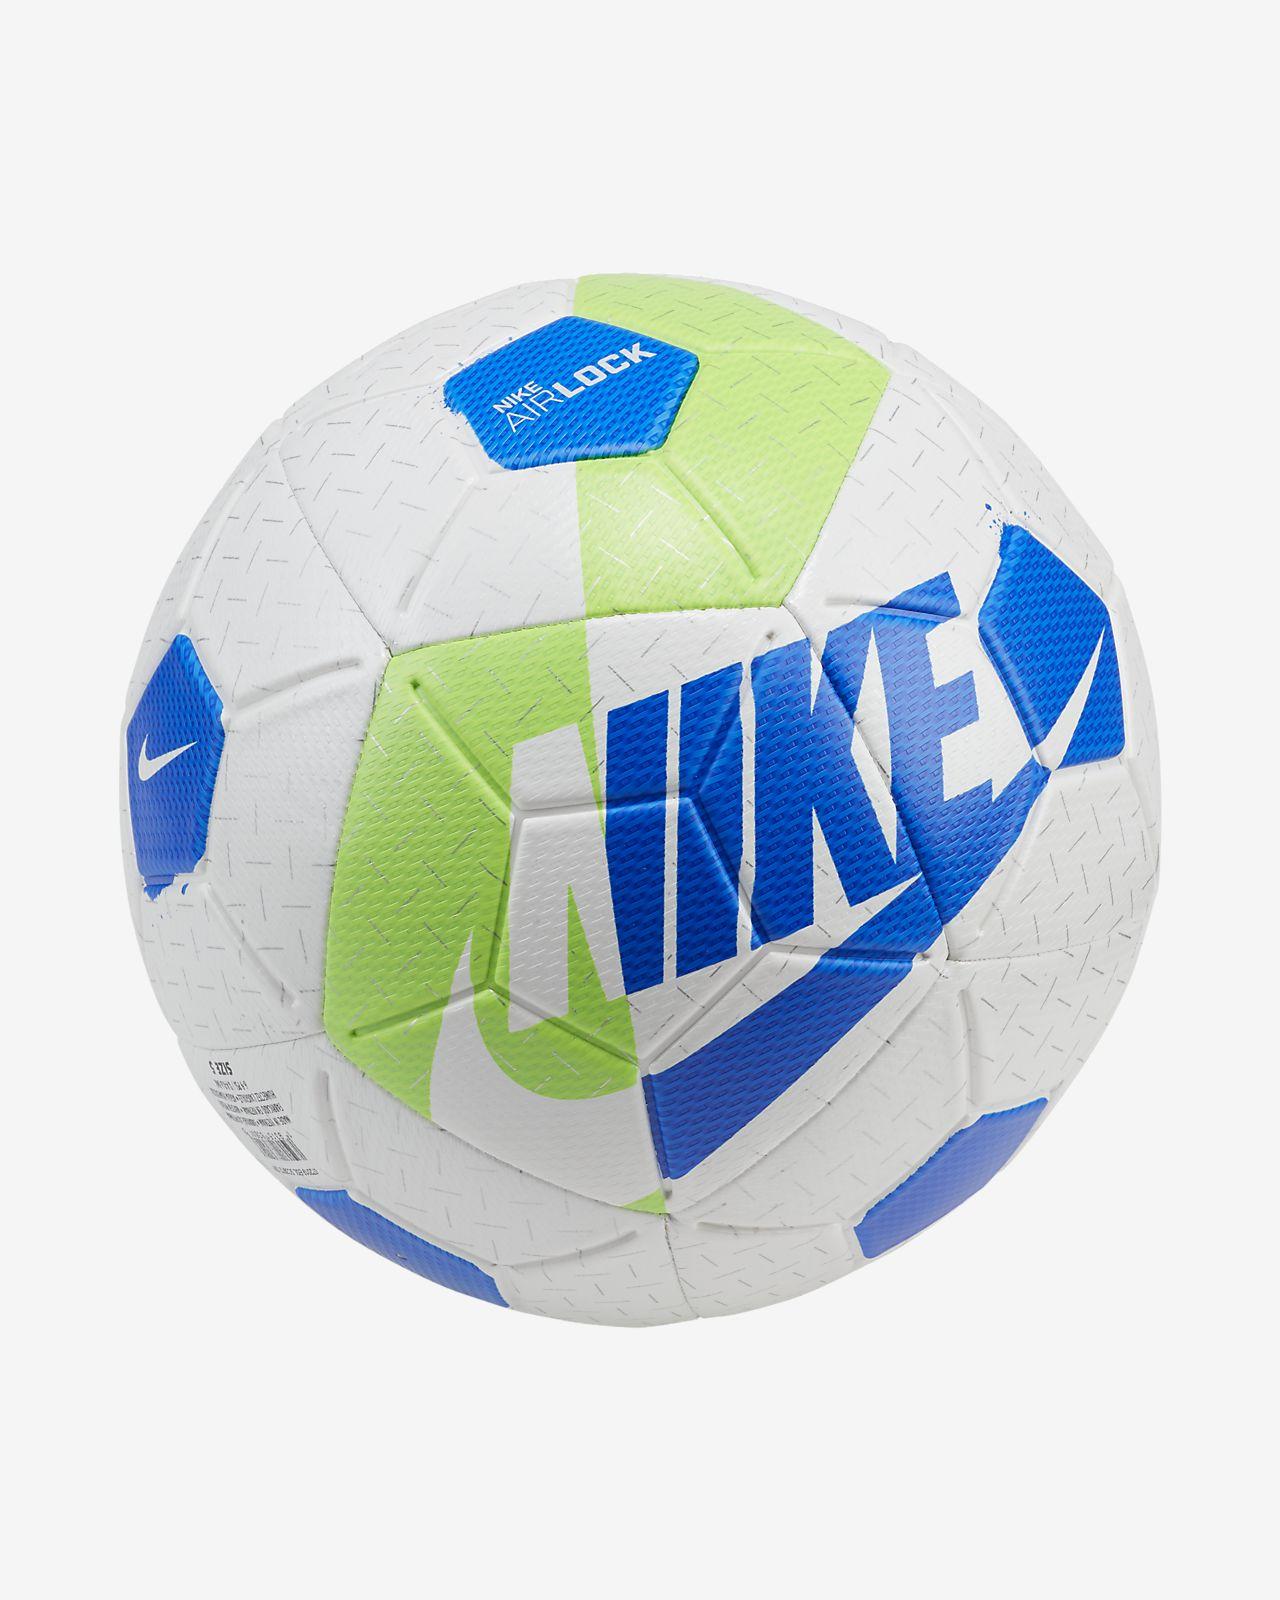 Nike Nike Street X Airlock Fußball Airlock X Nike Street Street Airlock Fußball HE2DI9